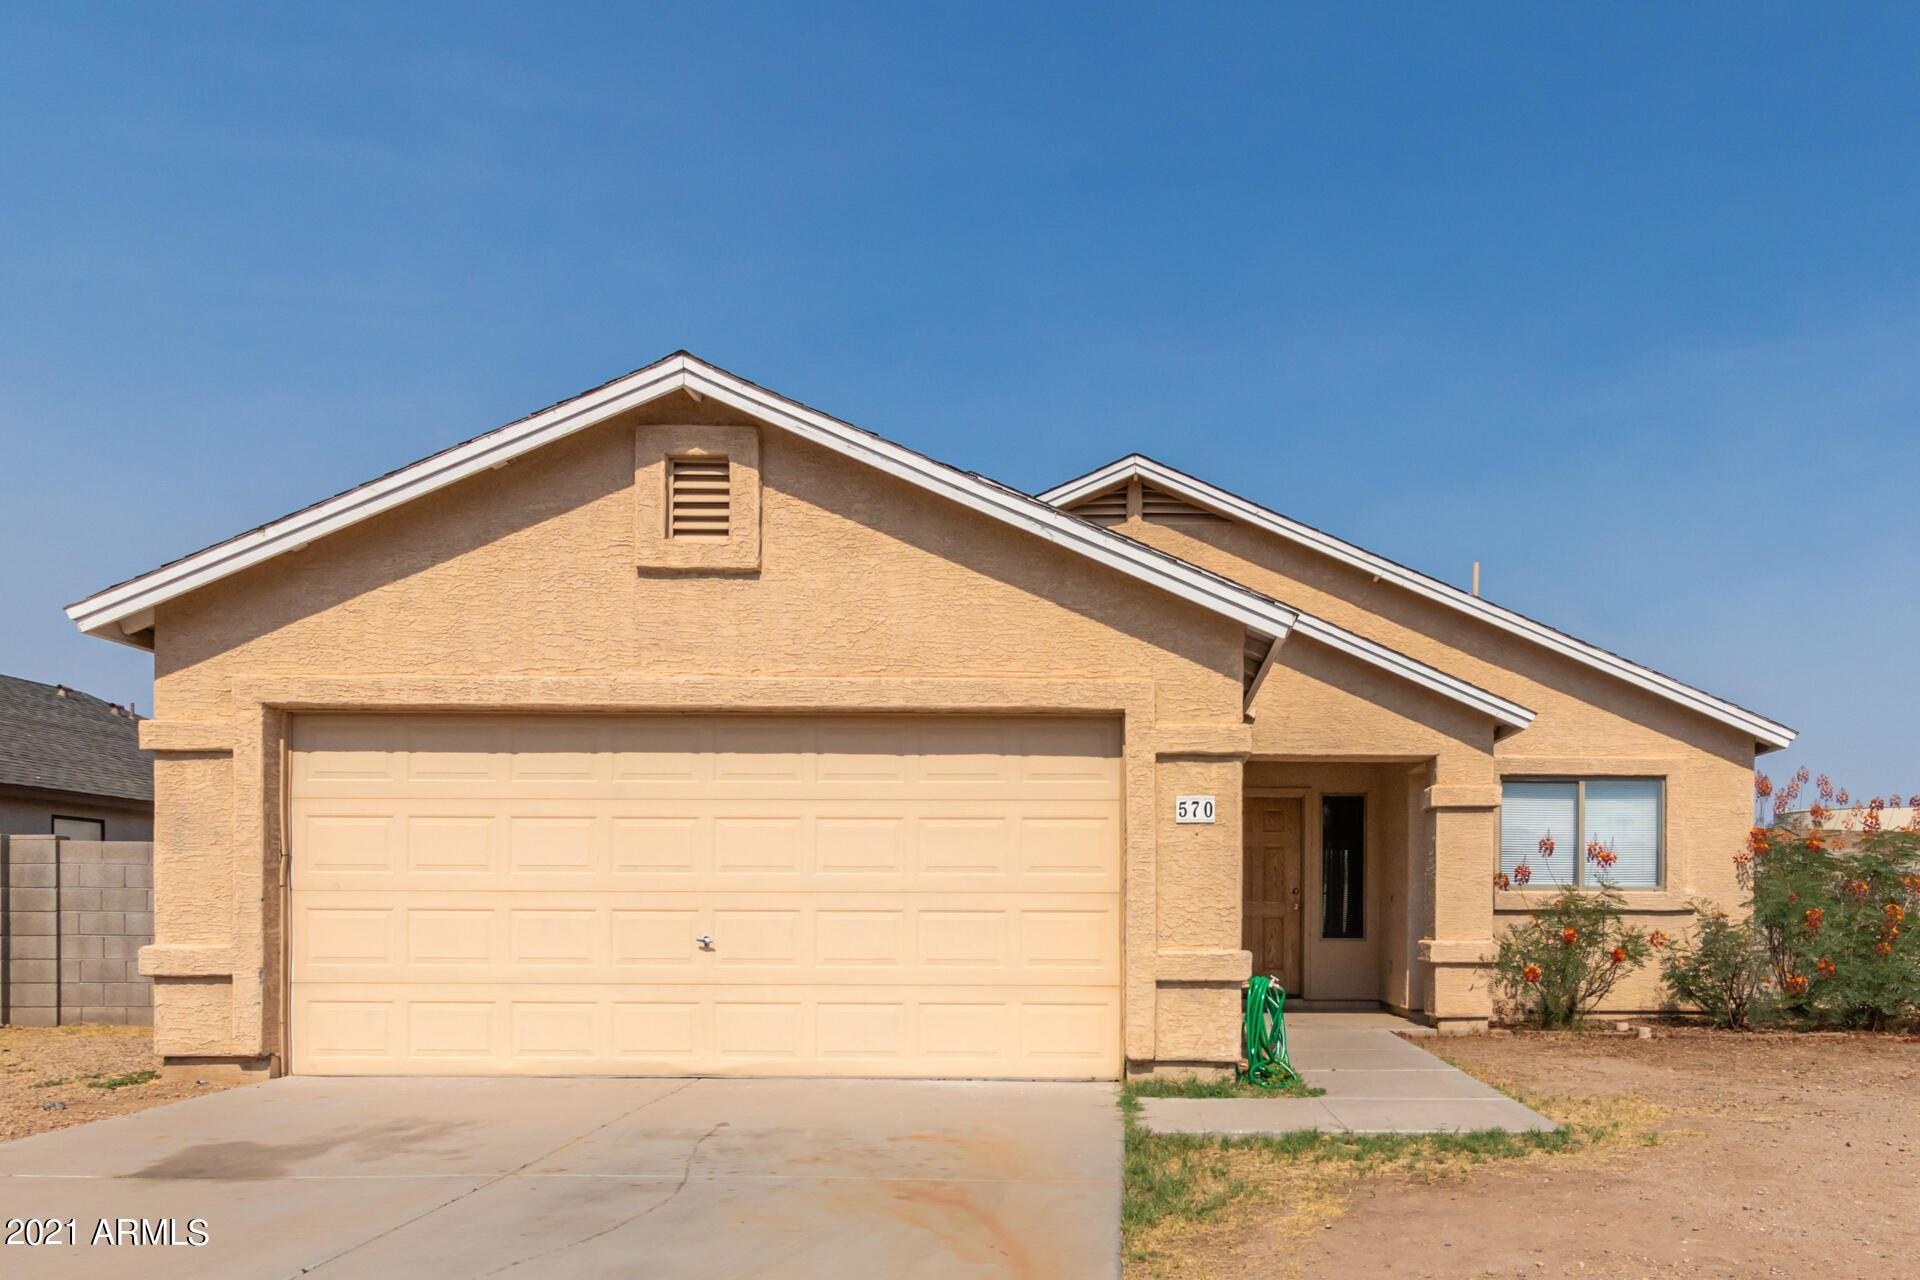 570 N RUBEL Court, Buckeye, AZ 85326 - MLS#: 6249692